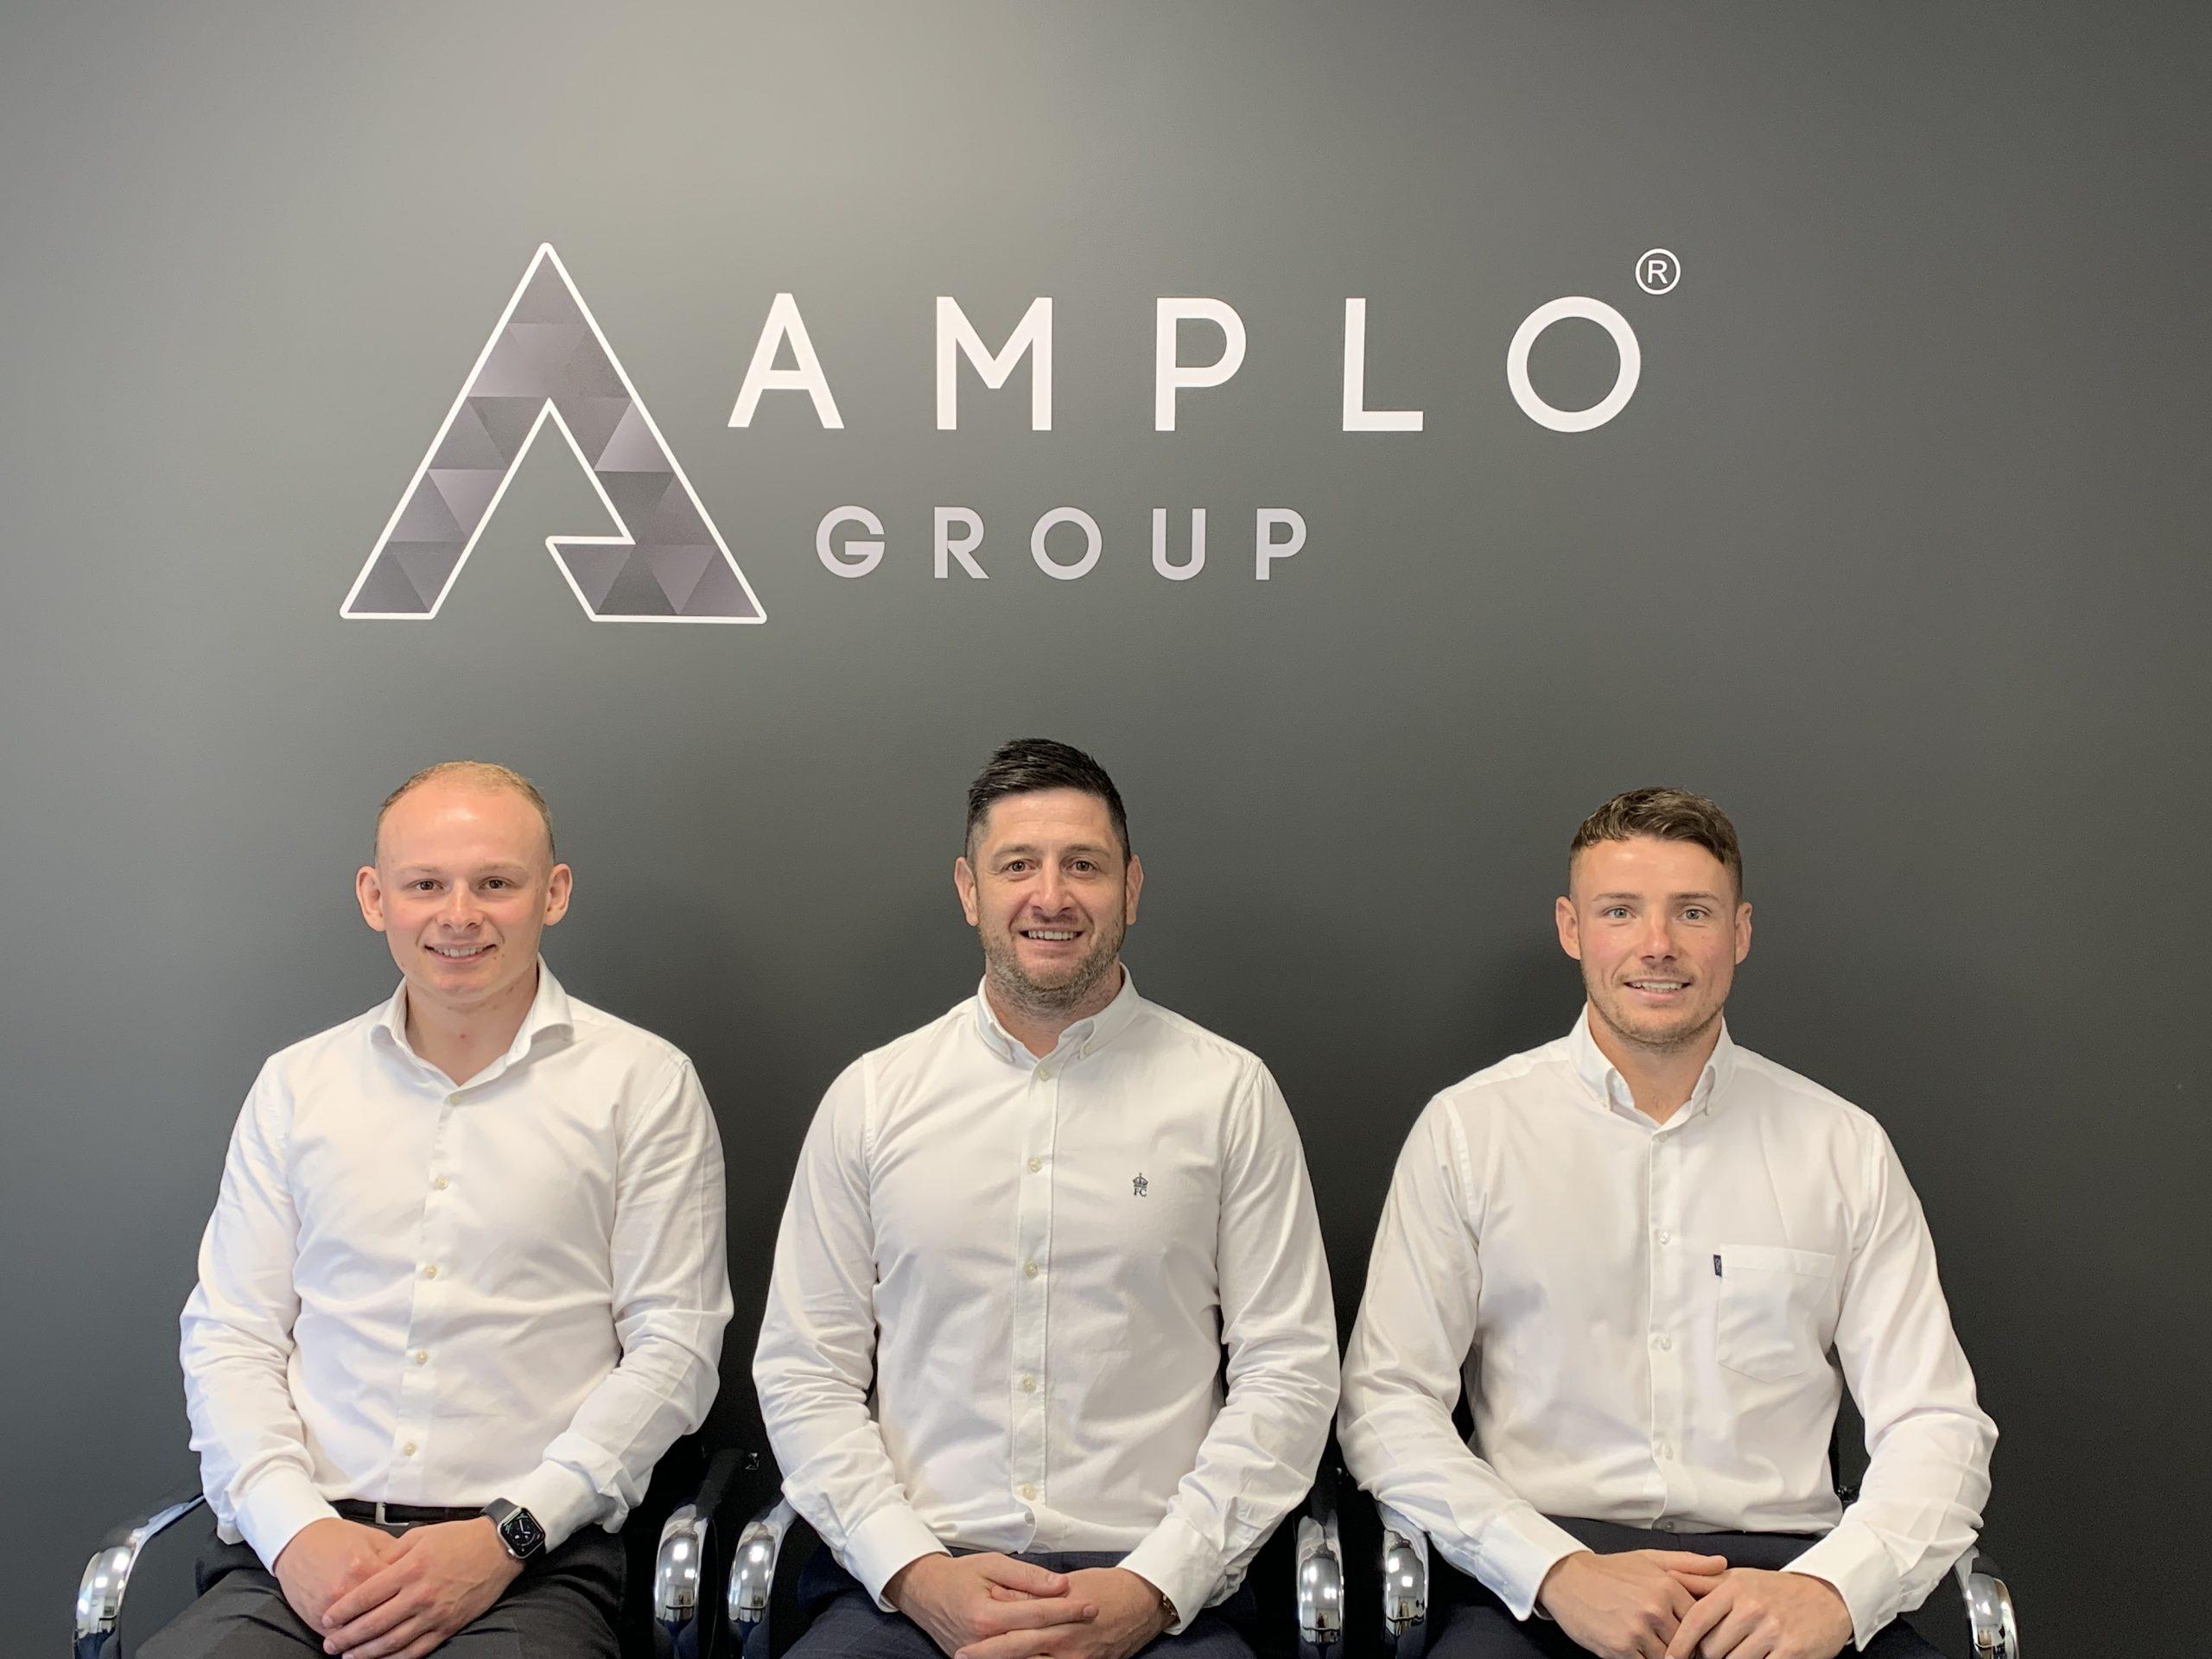 Amplo Commercial Directors - Mike, Scott and Matt